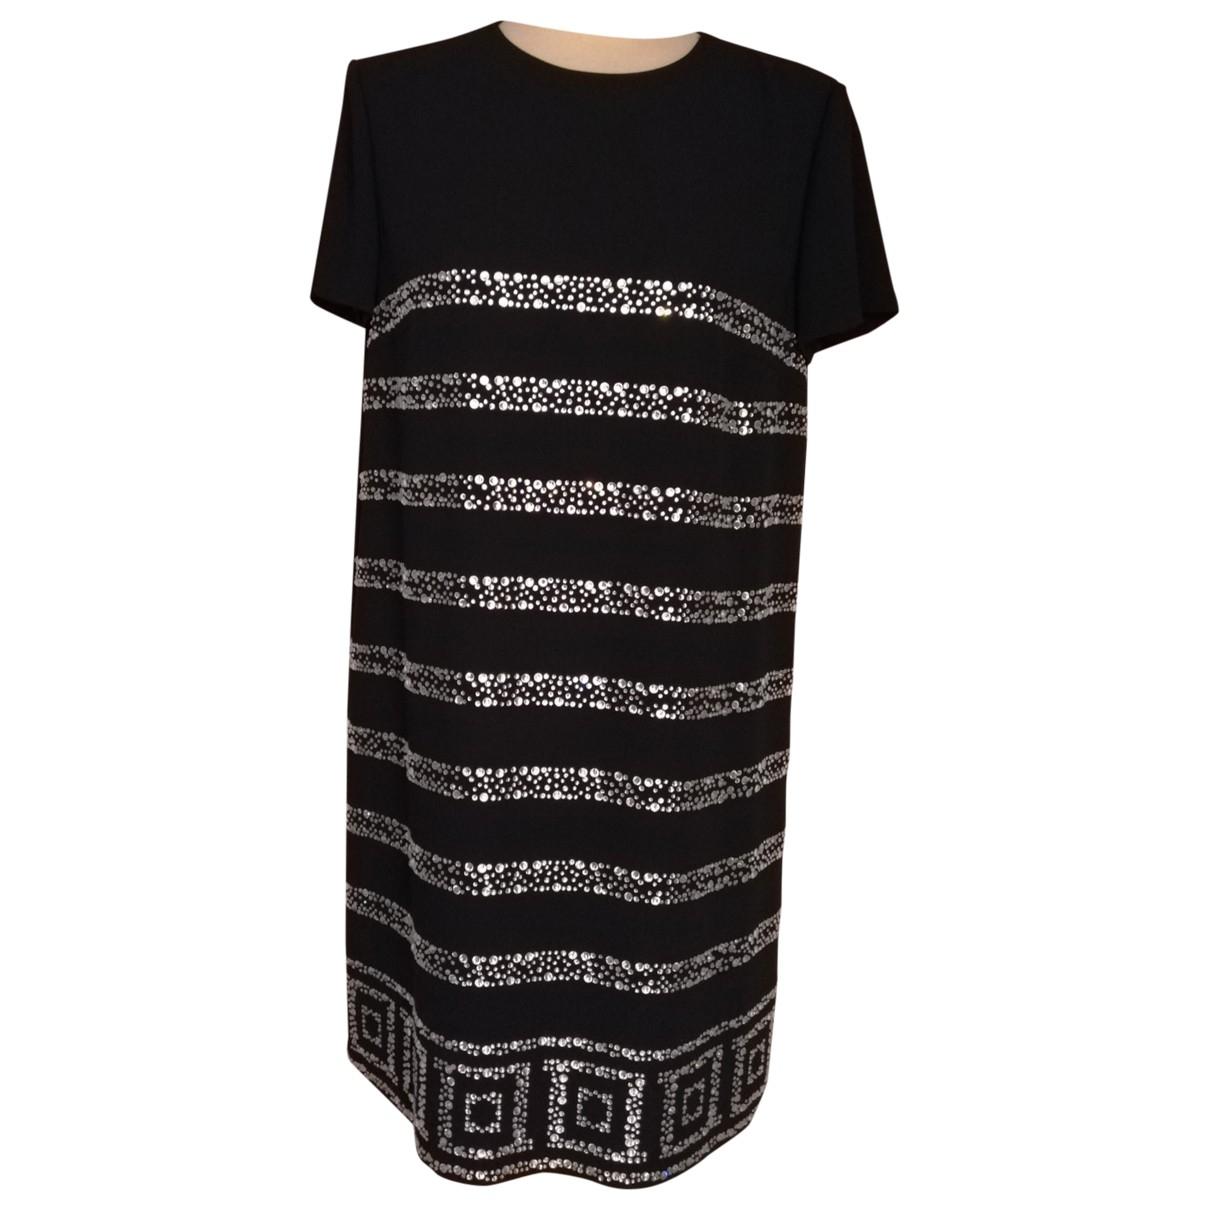 Versace \N Kleid in  Schwarz Polyester